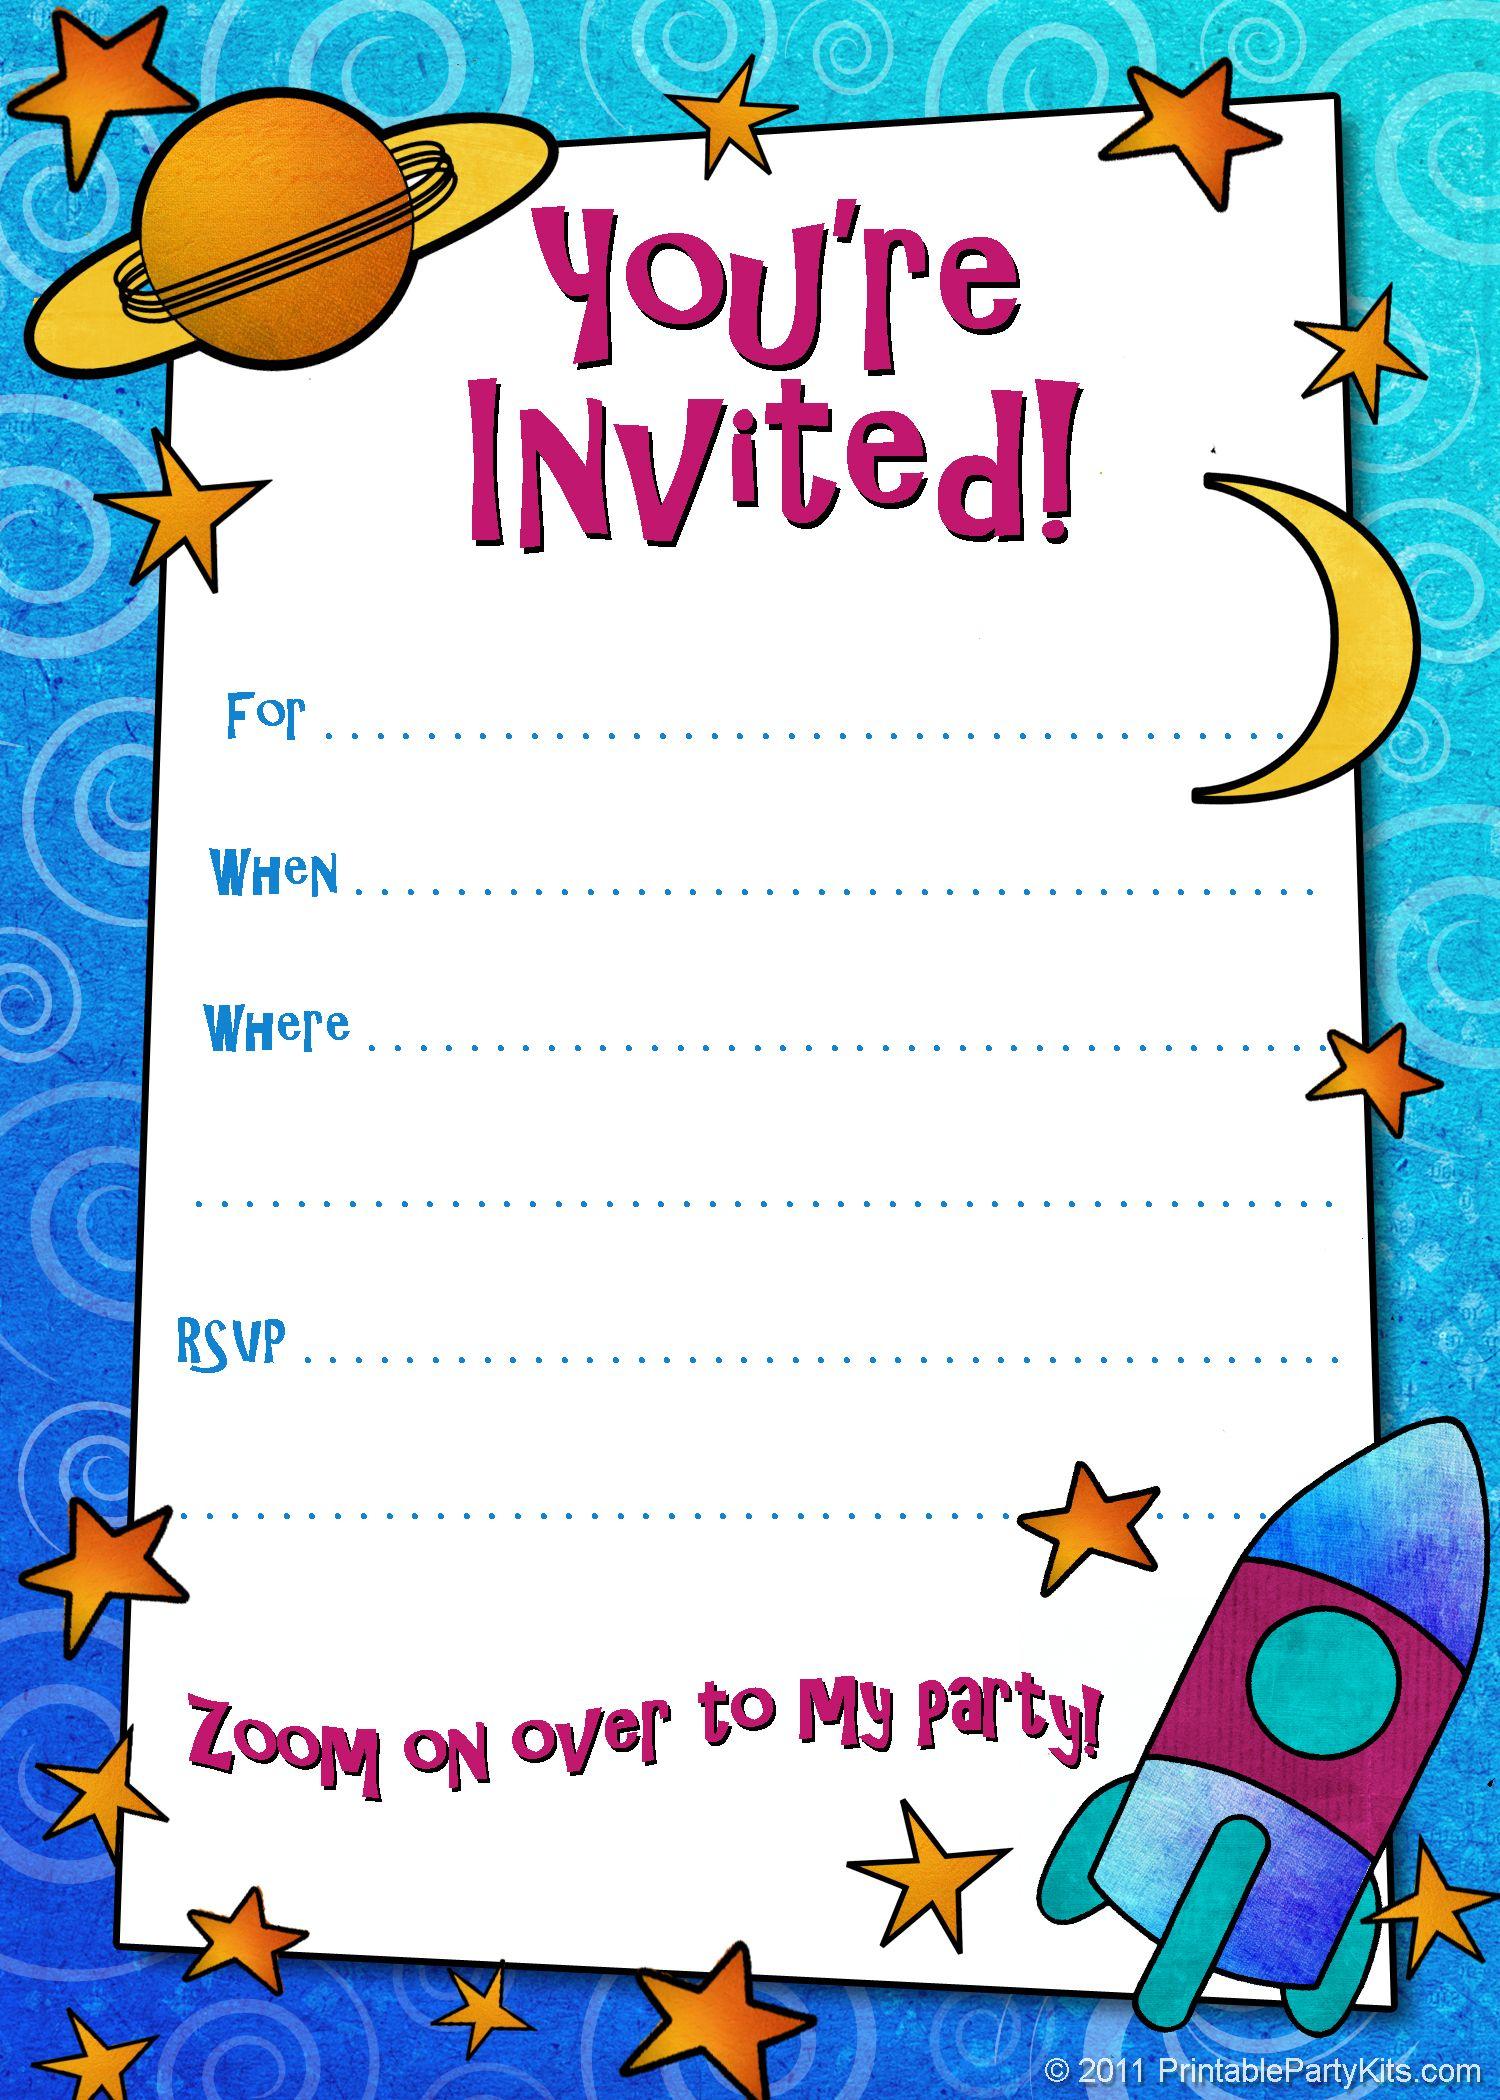 Free Printable Boys Birthday Party Invitations | Birthday Party - Free Printable Kids Birthday Cards Boys